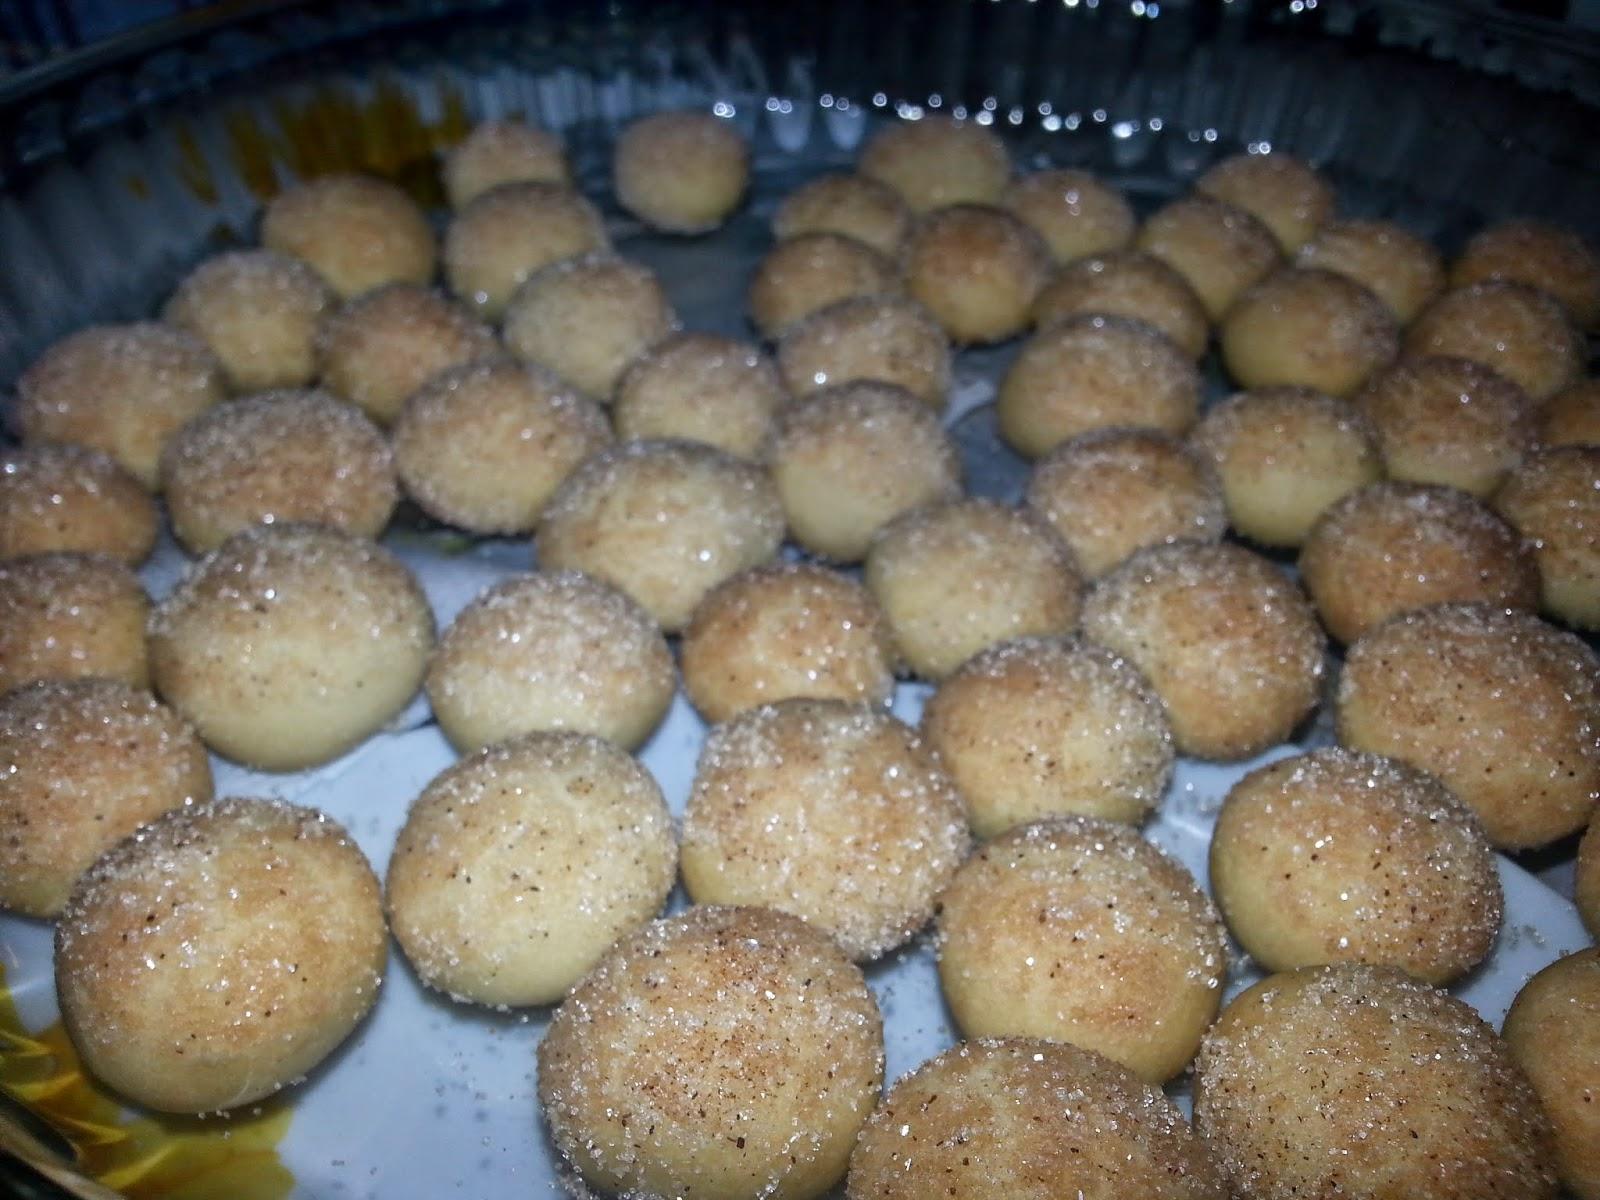 minik-tatlı-toplar